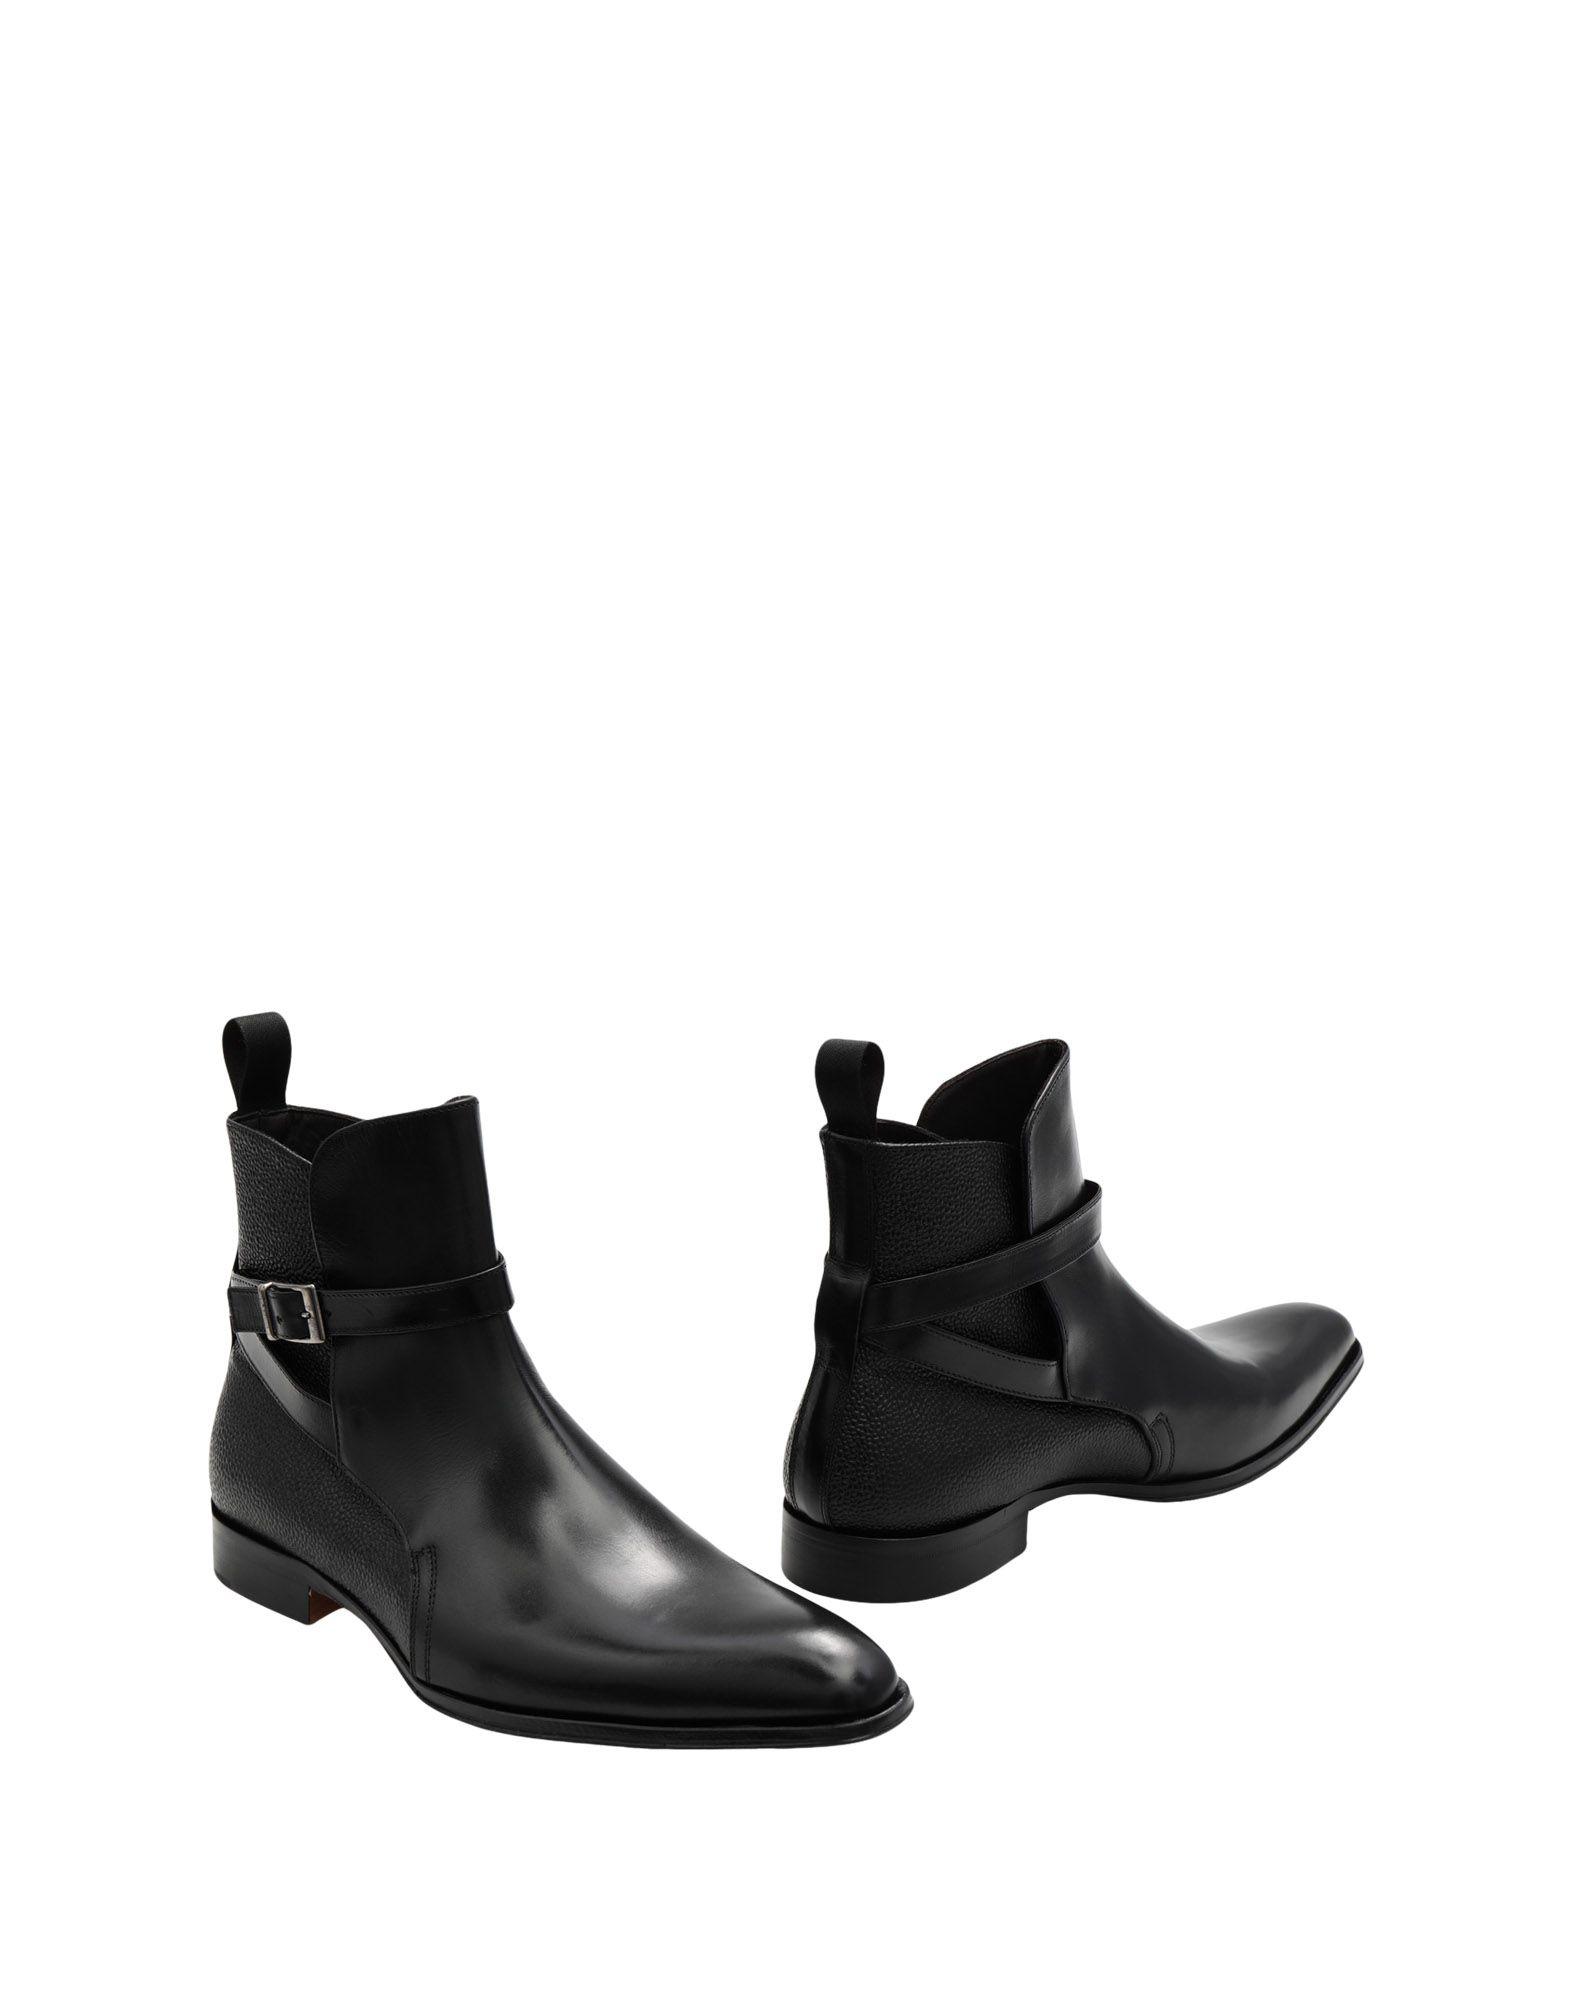 Leonardo Principi Stiefelette Herren  11524813UA Gute Qualität beliebte Schuhe